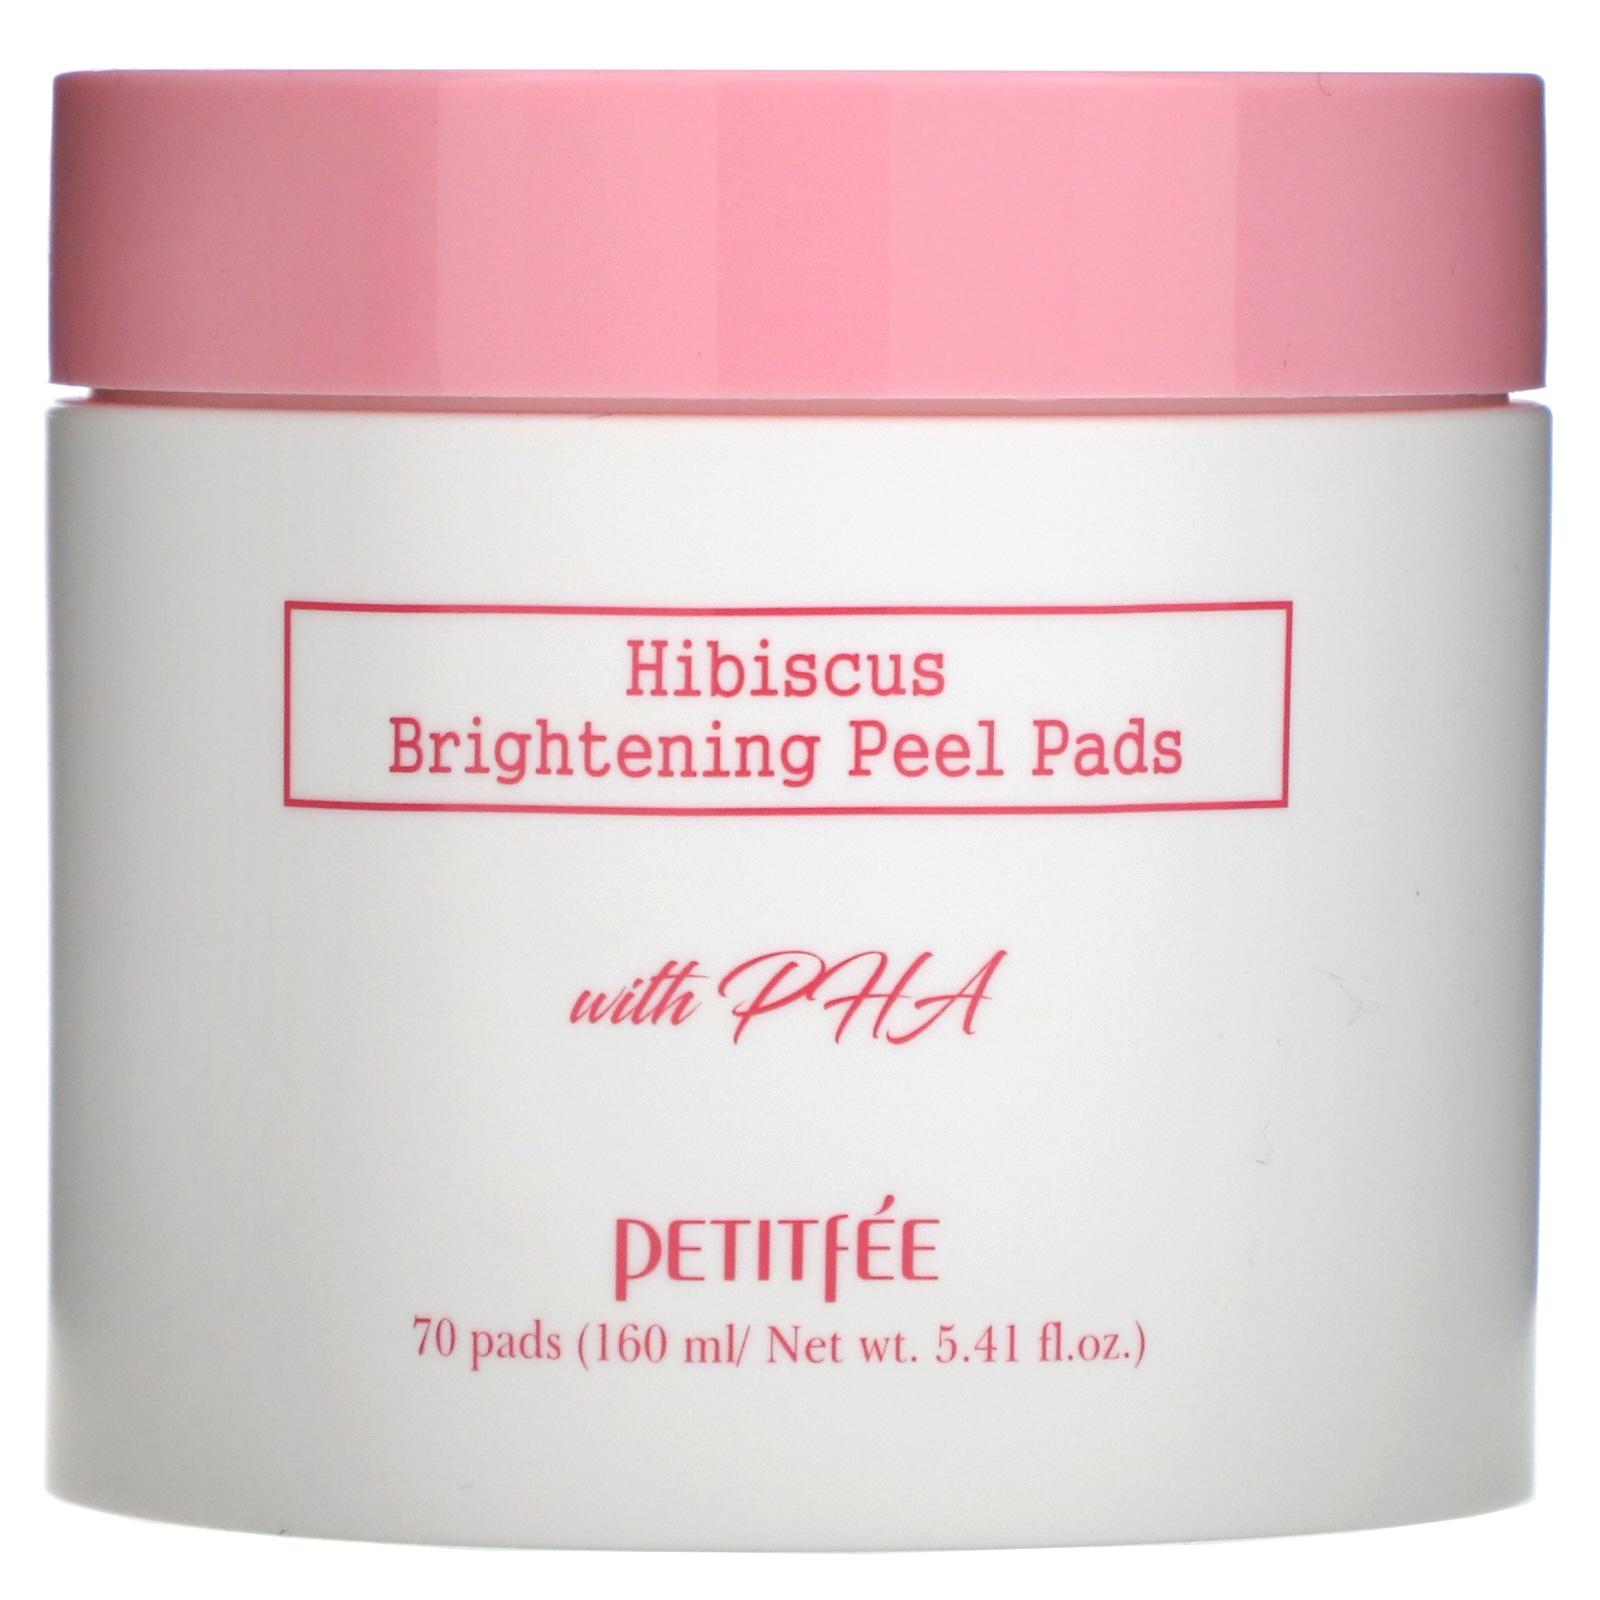 Petitfee , Hibiscus, Brightening Peel Pads